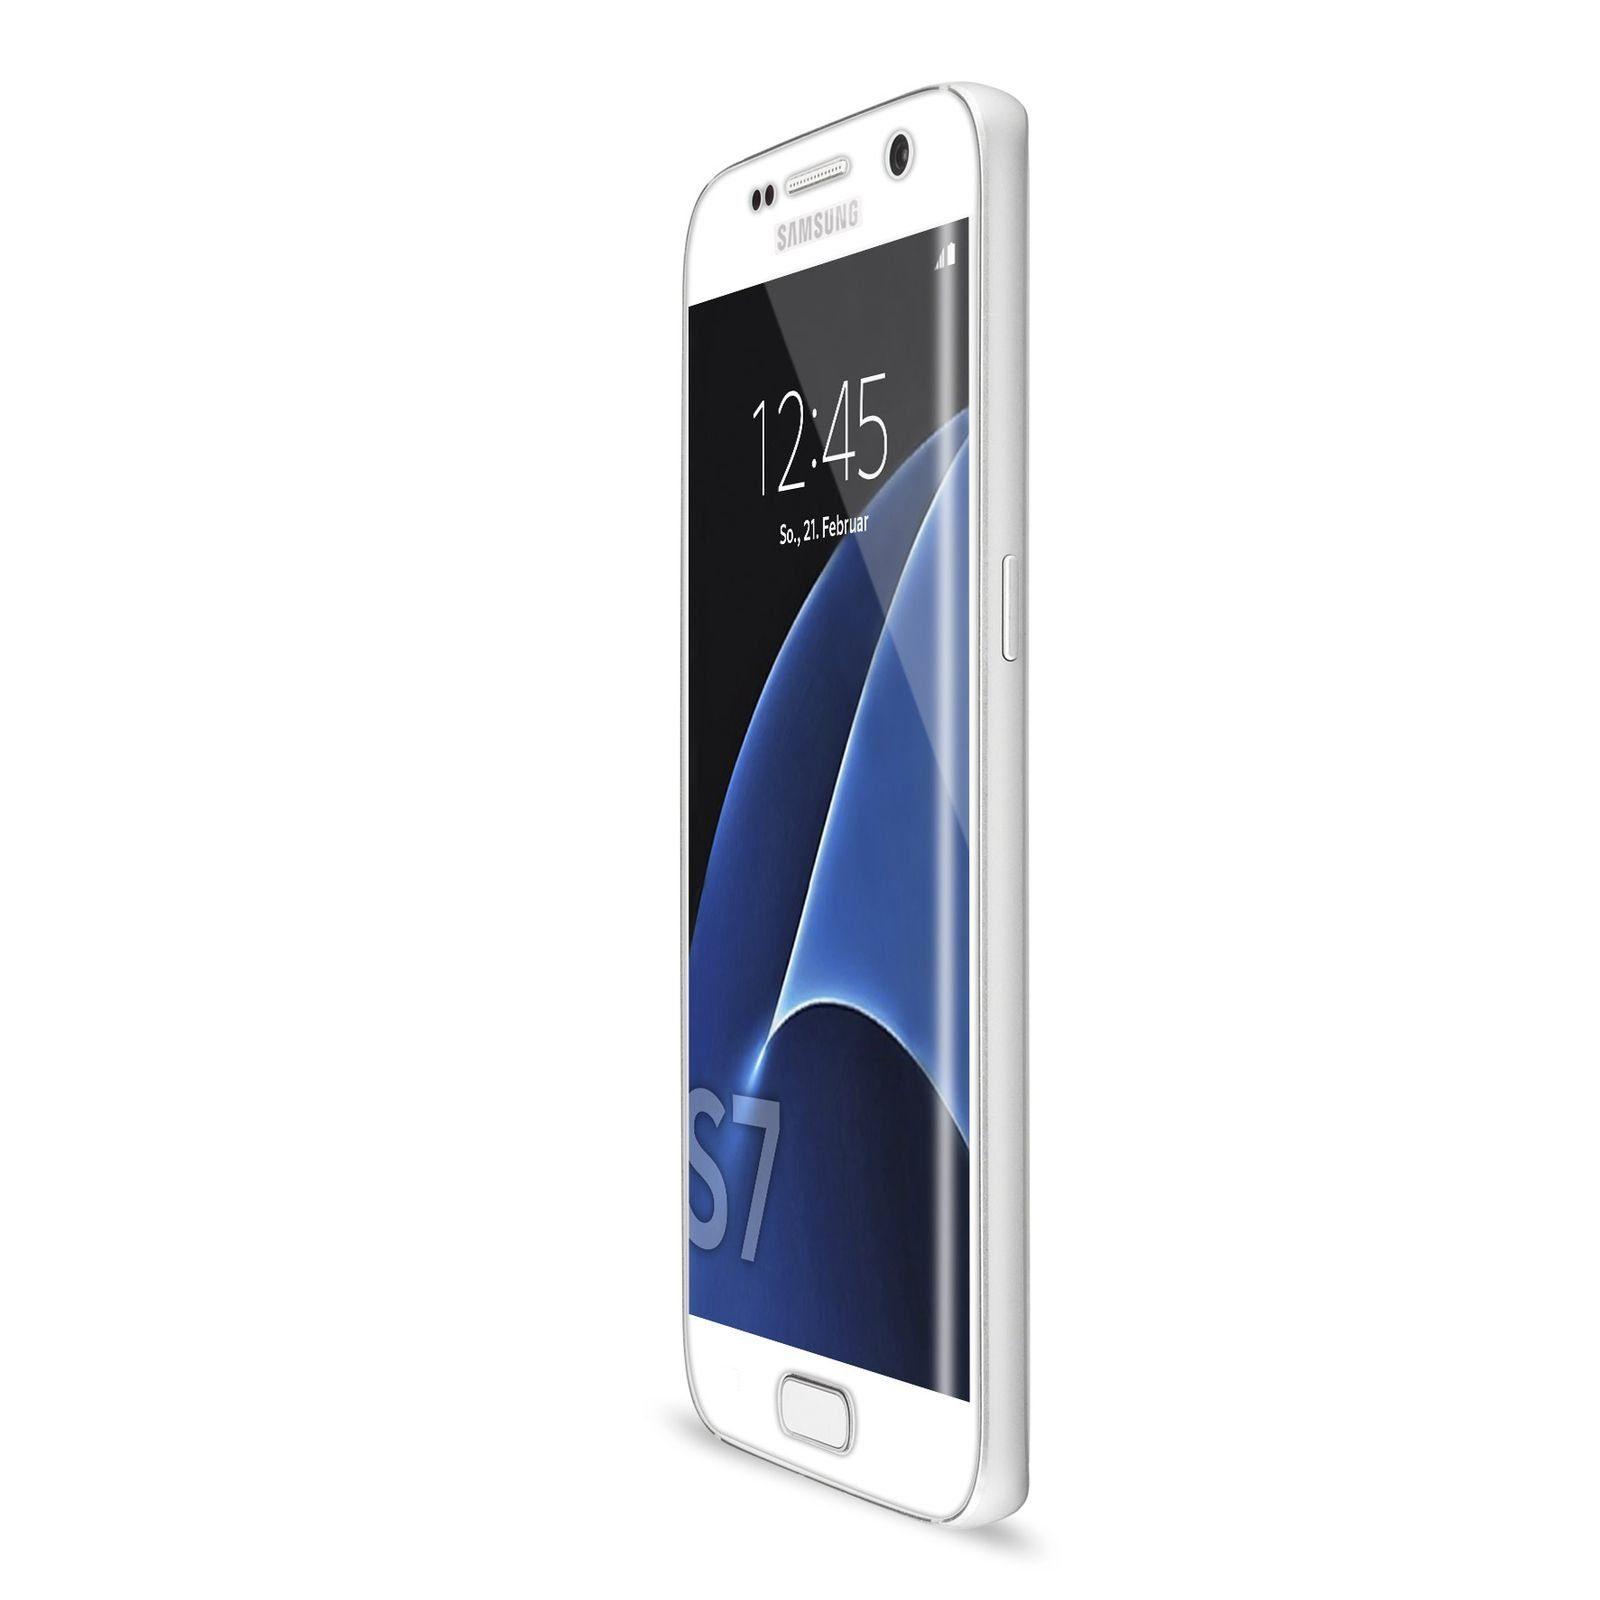 Artwizz »CurvedDisplay Samsung Galaxy S7« für Samsung Galaxy S7, Displayschutzglas, 1 Stück, 100% Glas